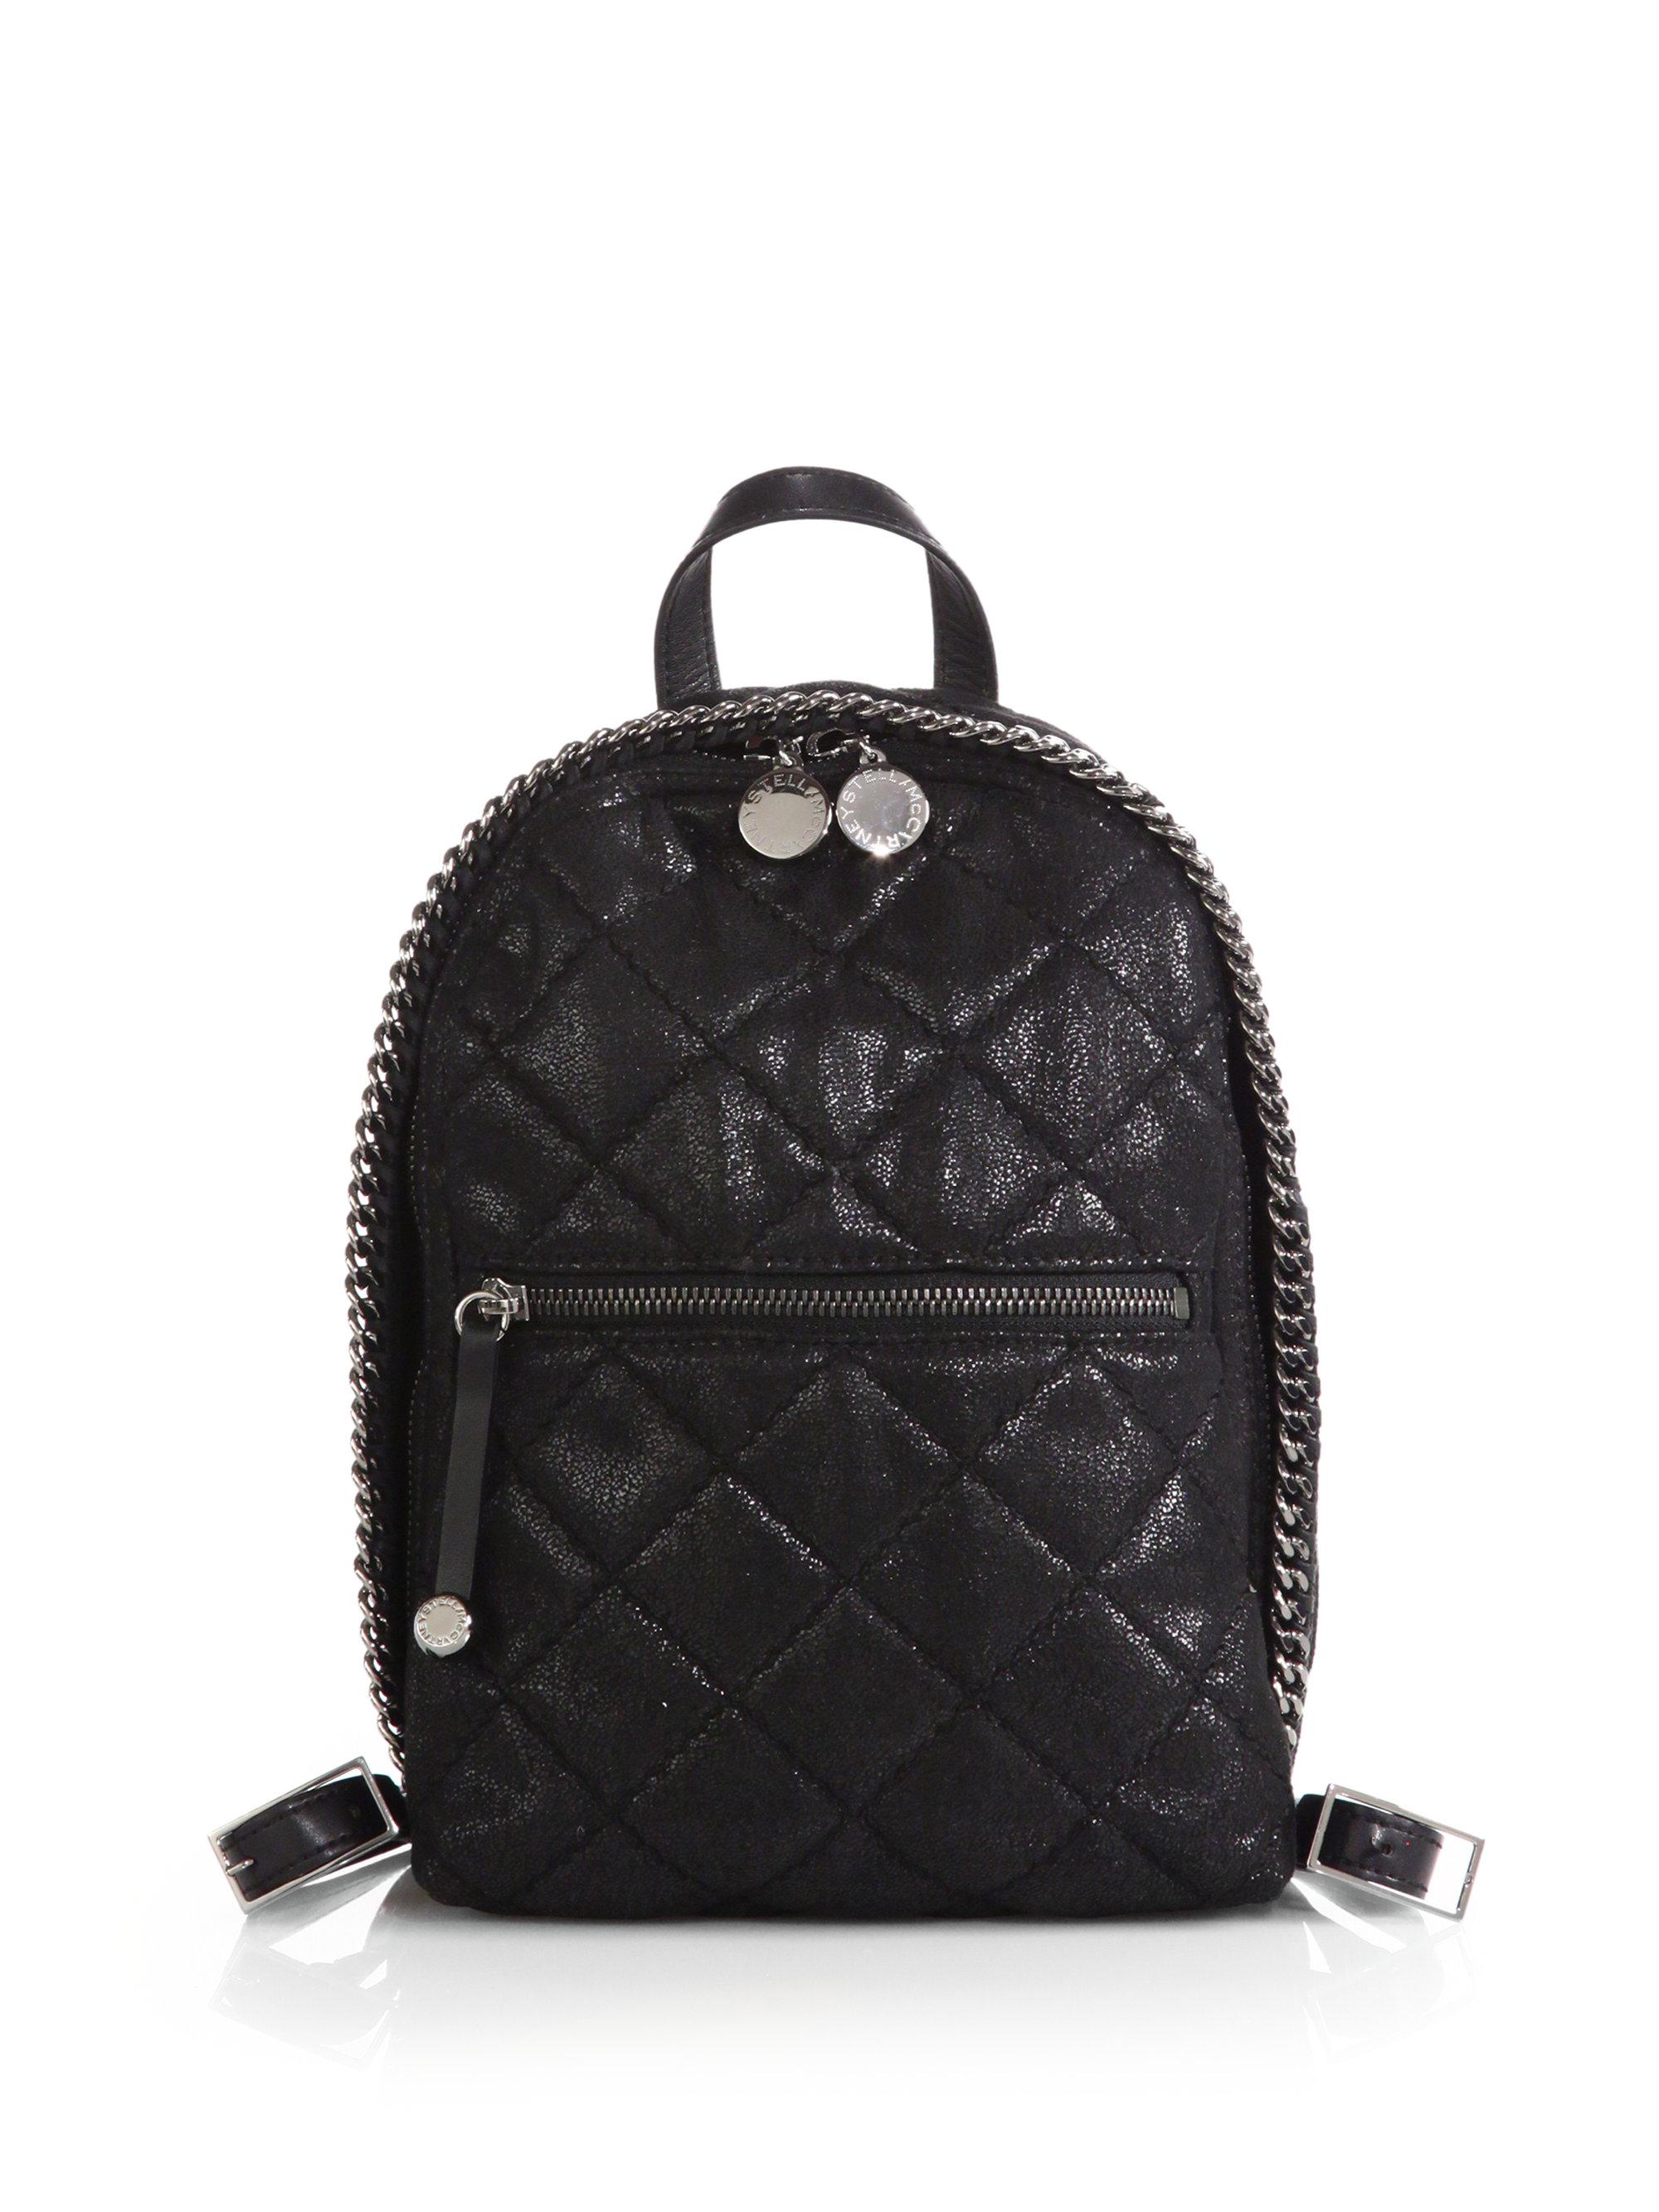 Lyst - Stella mccartney Quilted Faux-leather Mini Backpack in Black : quilted faux leather backpack - Adamdwight.com